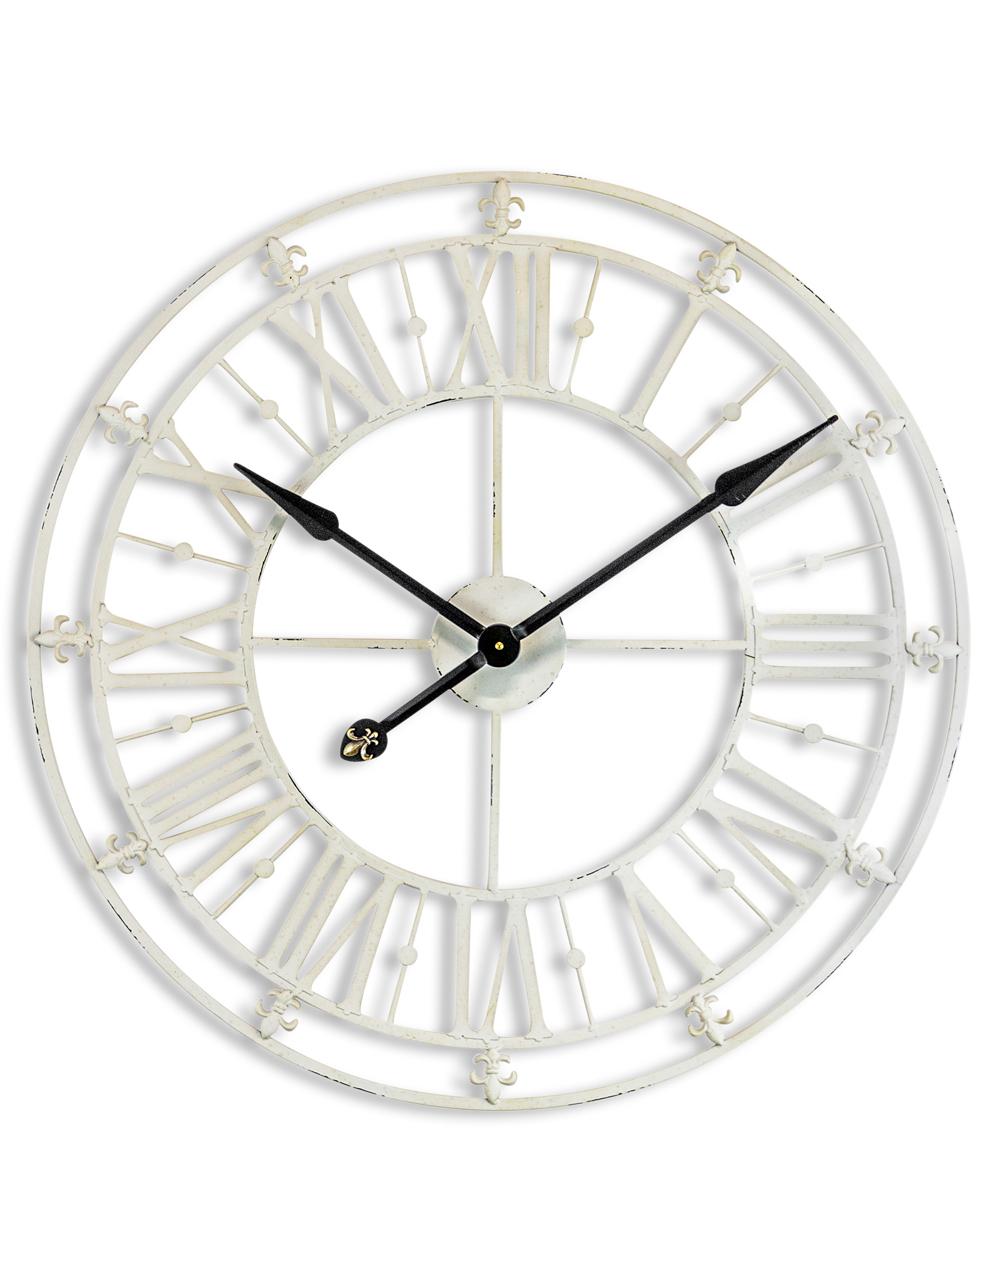 Skeleton Iron Wall Clock Tang Amp Co Home